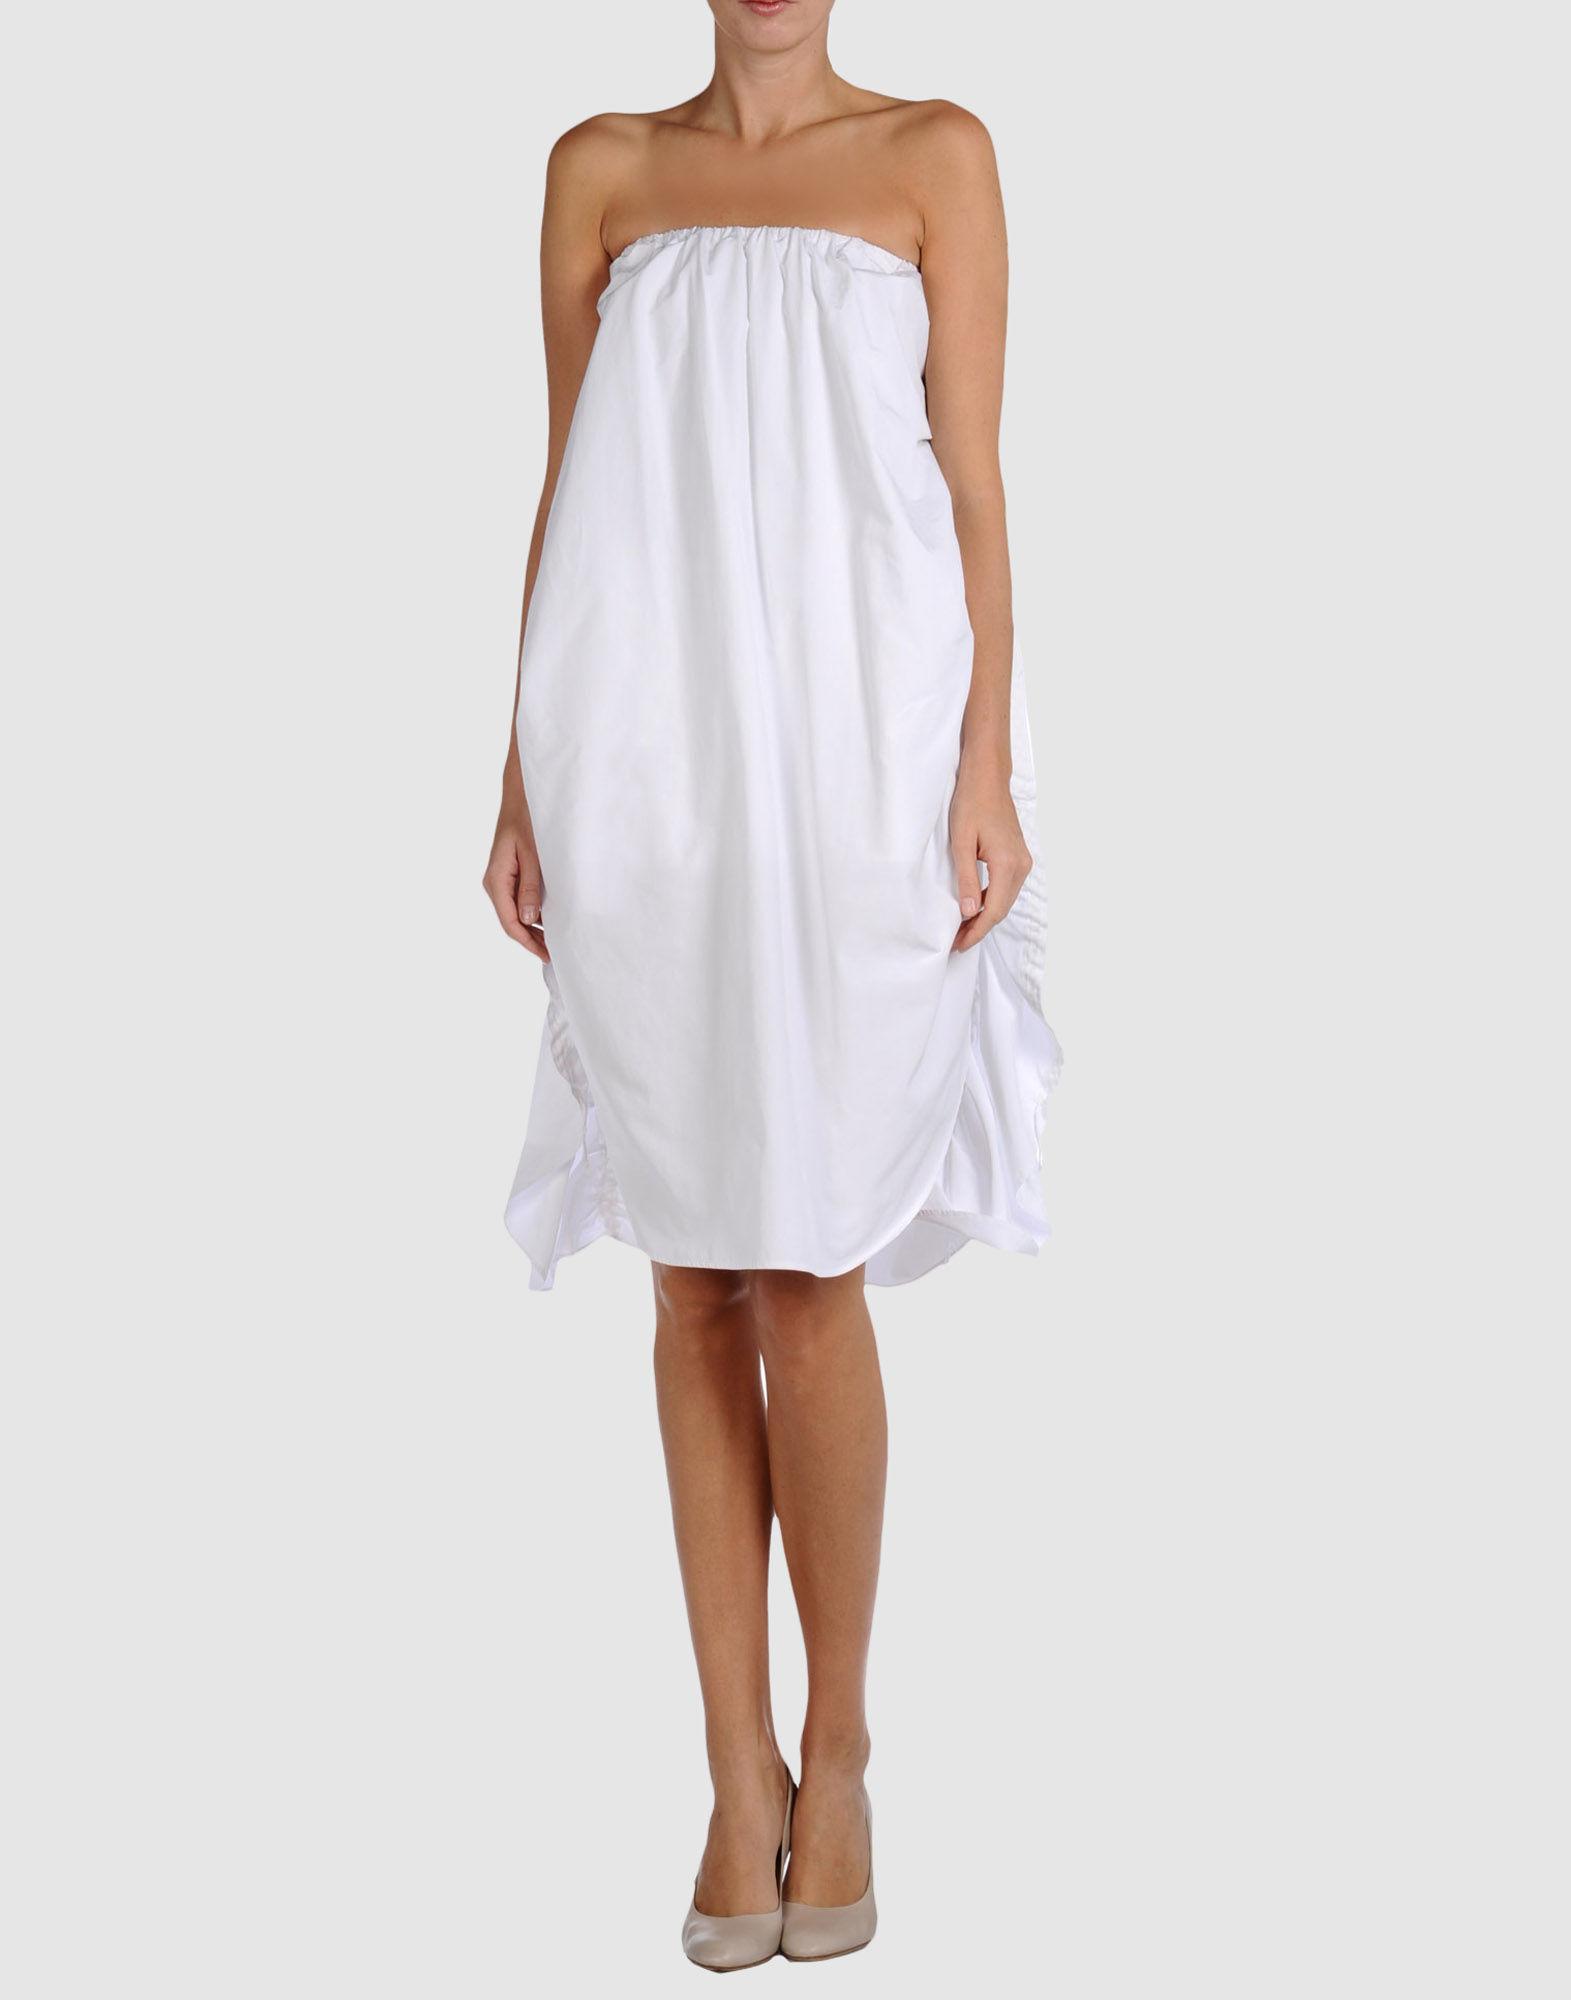 34237419CX 14 f - Βραδυνα Φορεματα Yves Saint Laurent Rive Gauche Κωδ.19